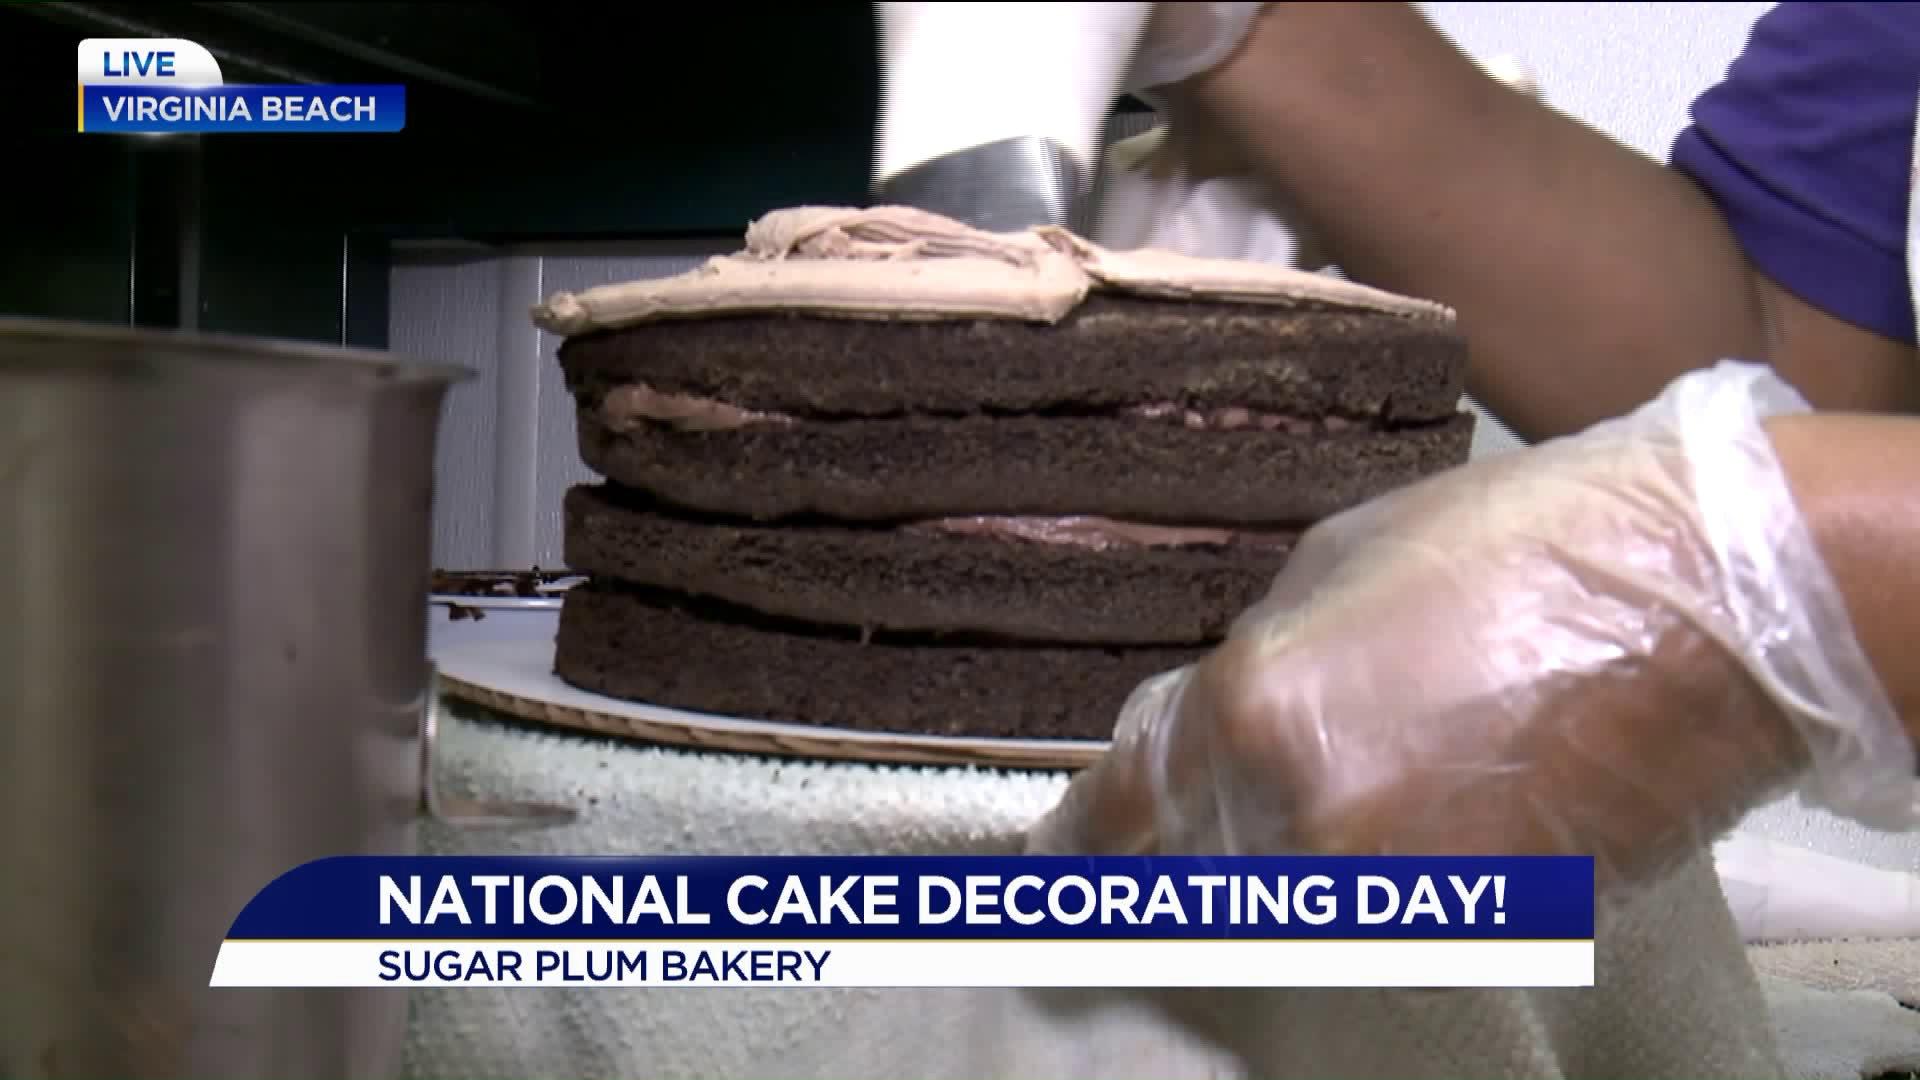 Cake decorating at Sugar Plum Bakery